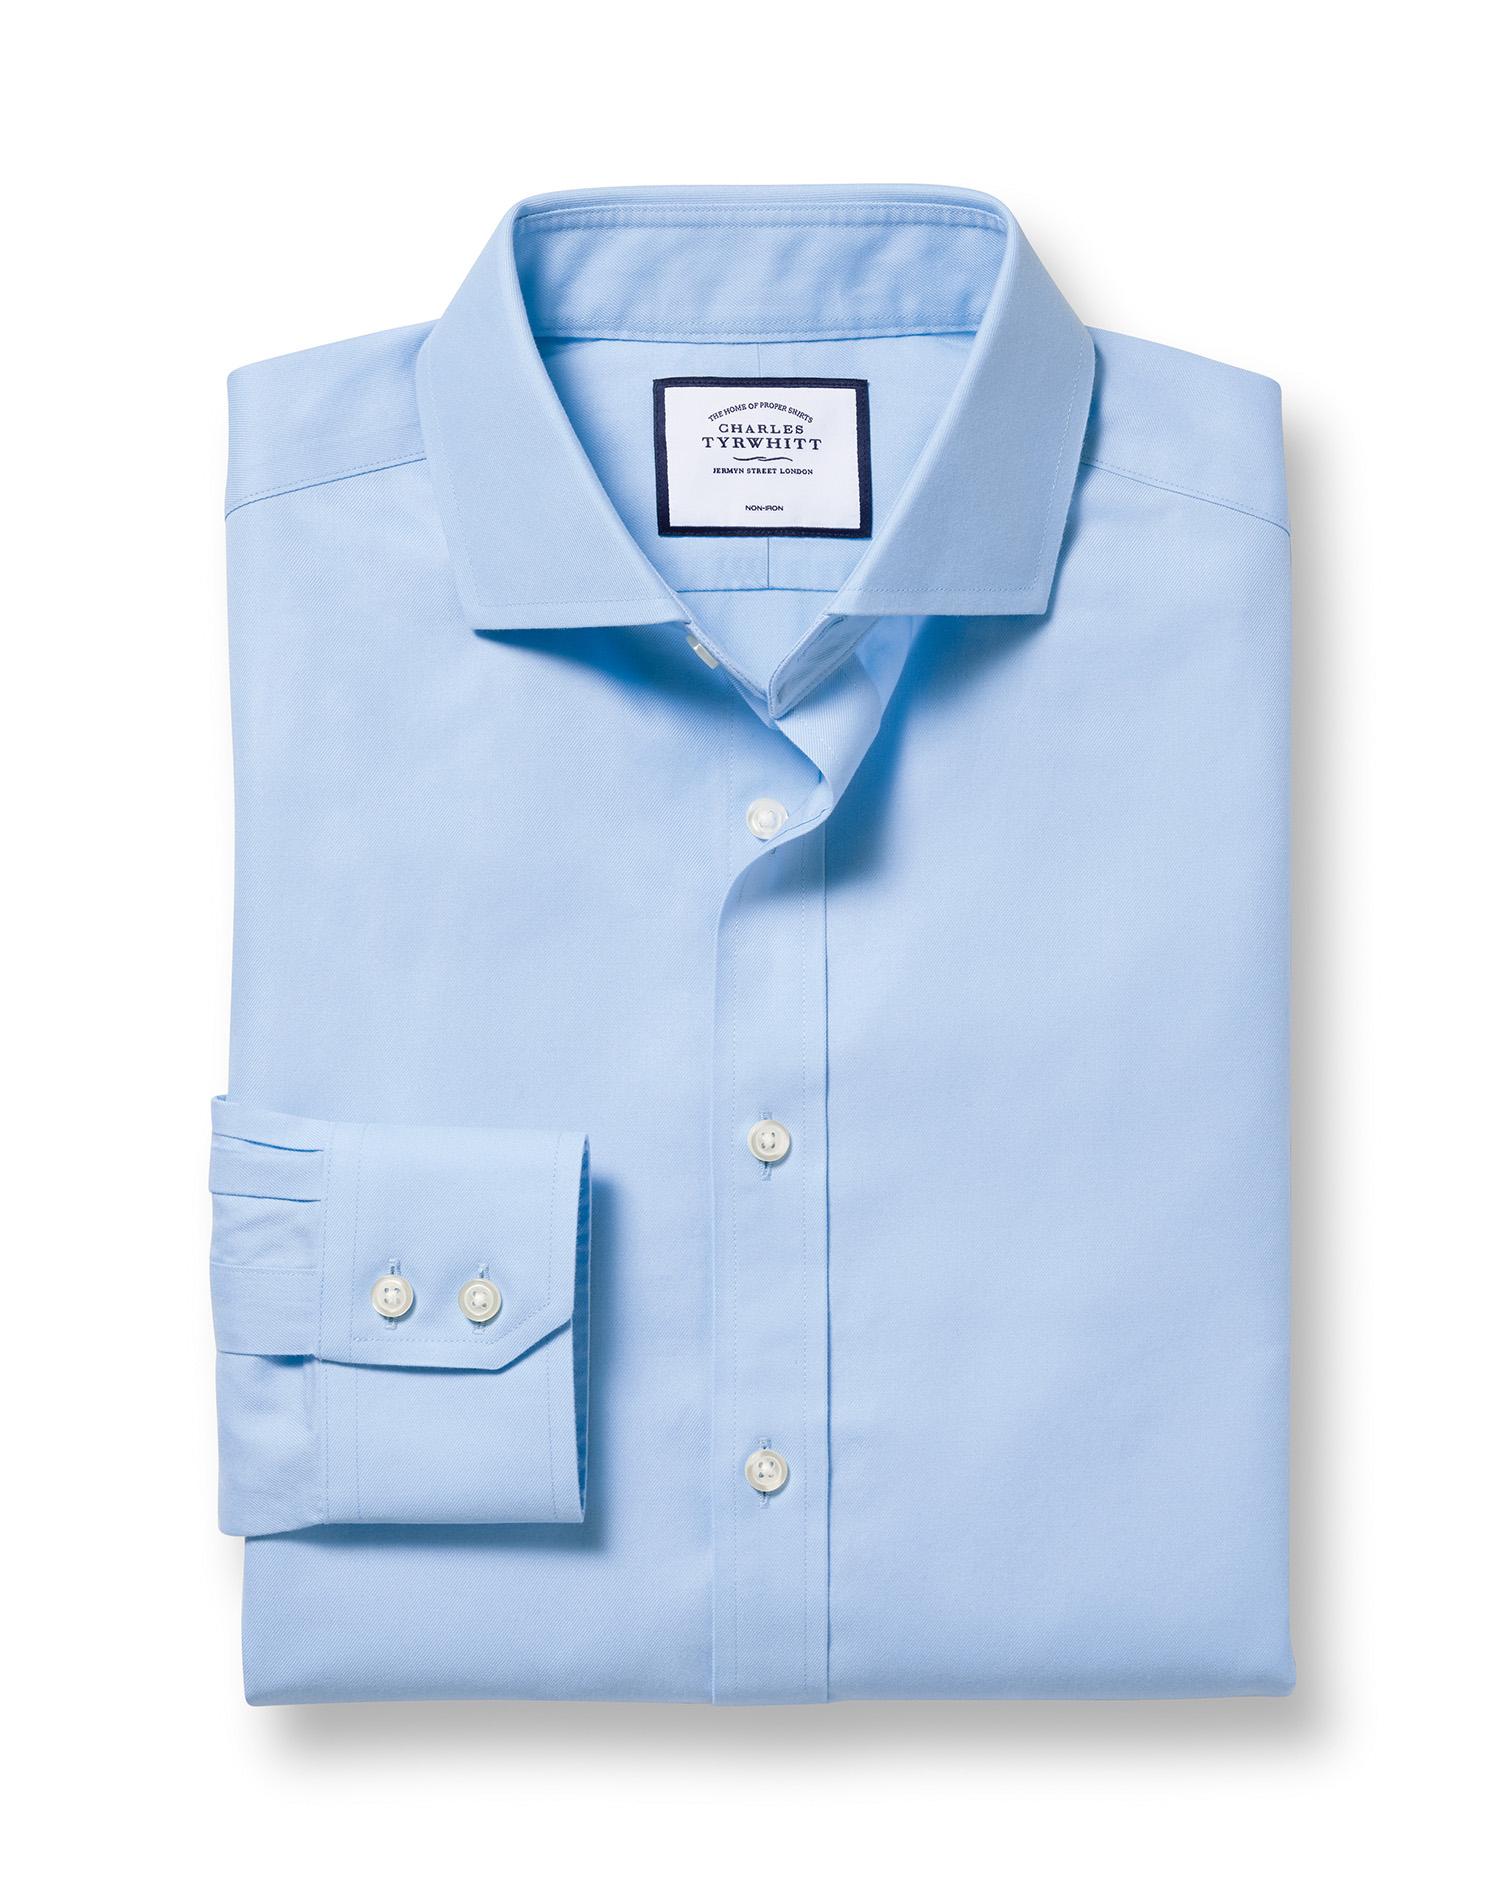 Cotton Slim Fit Sky Blue Non-Iron Twill Cutaway Shirt